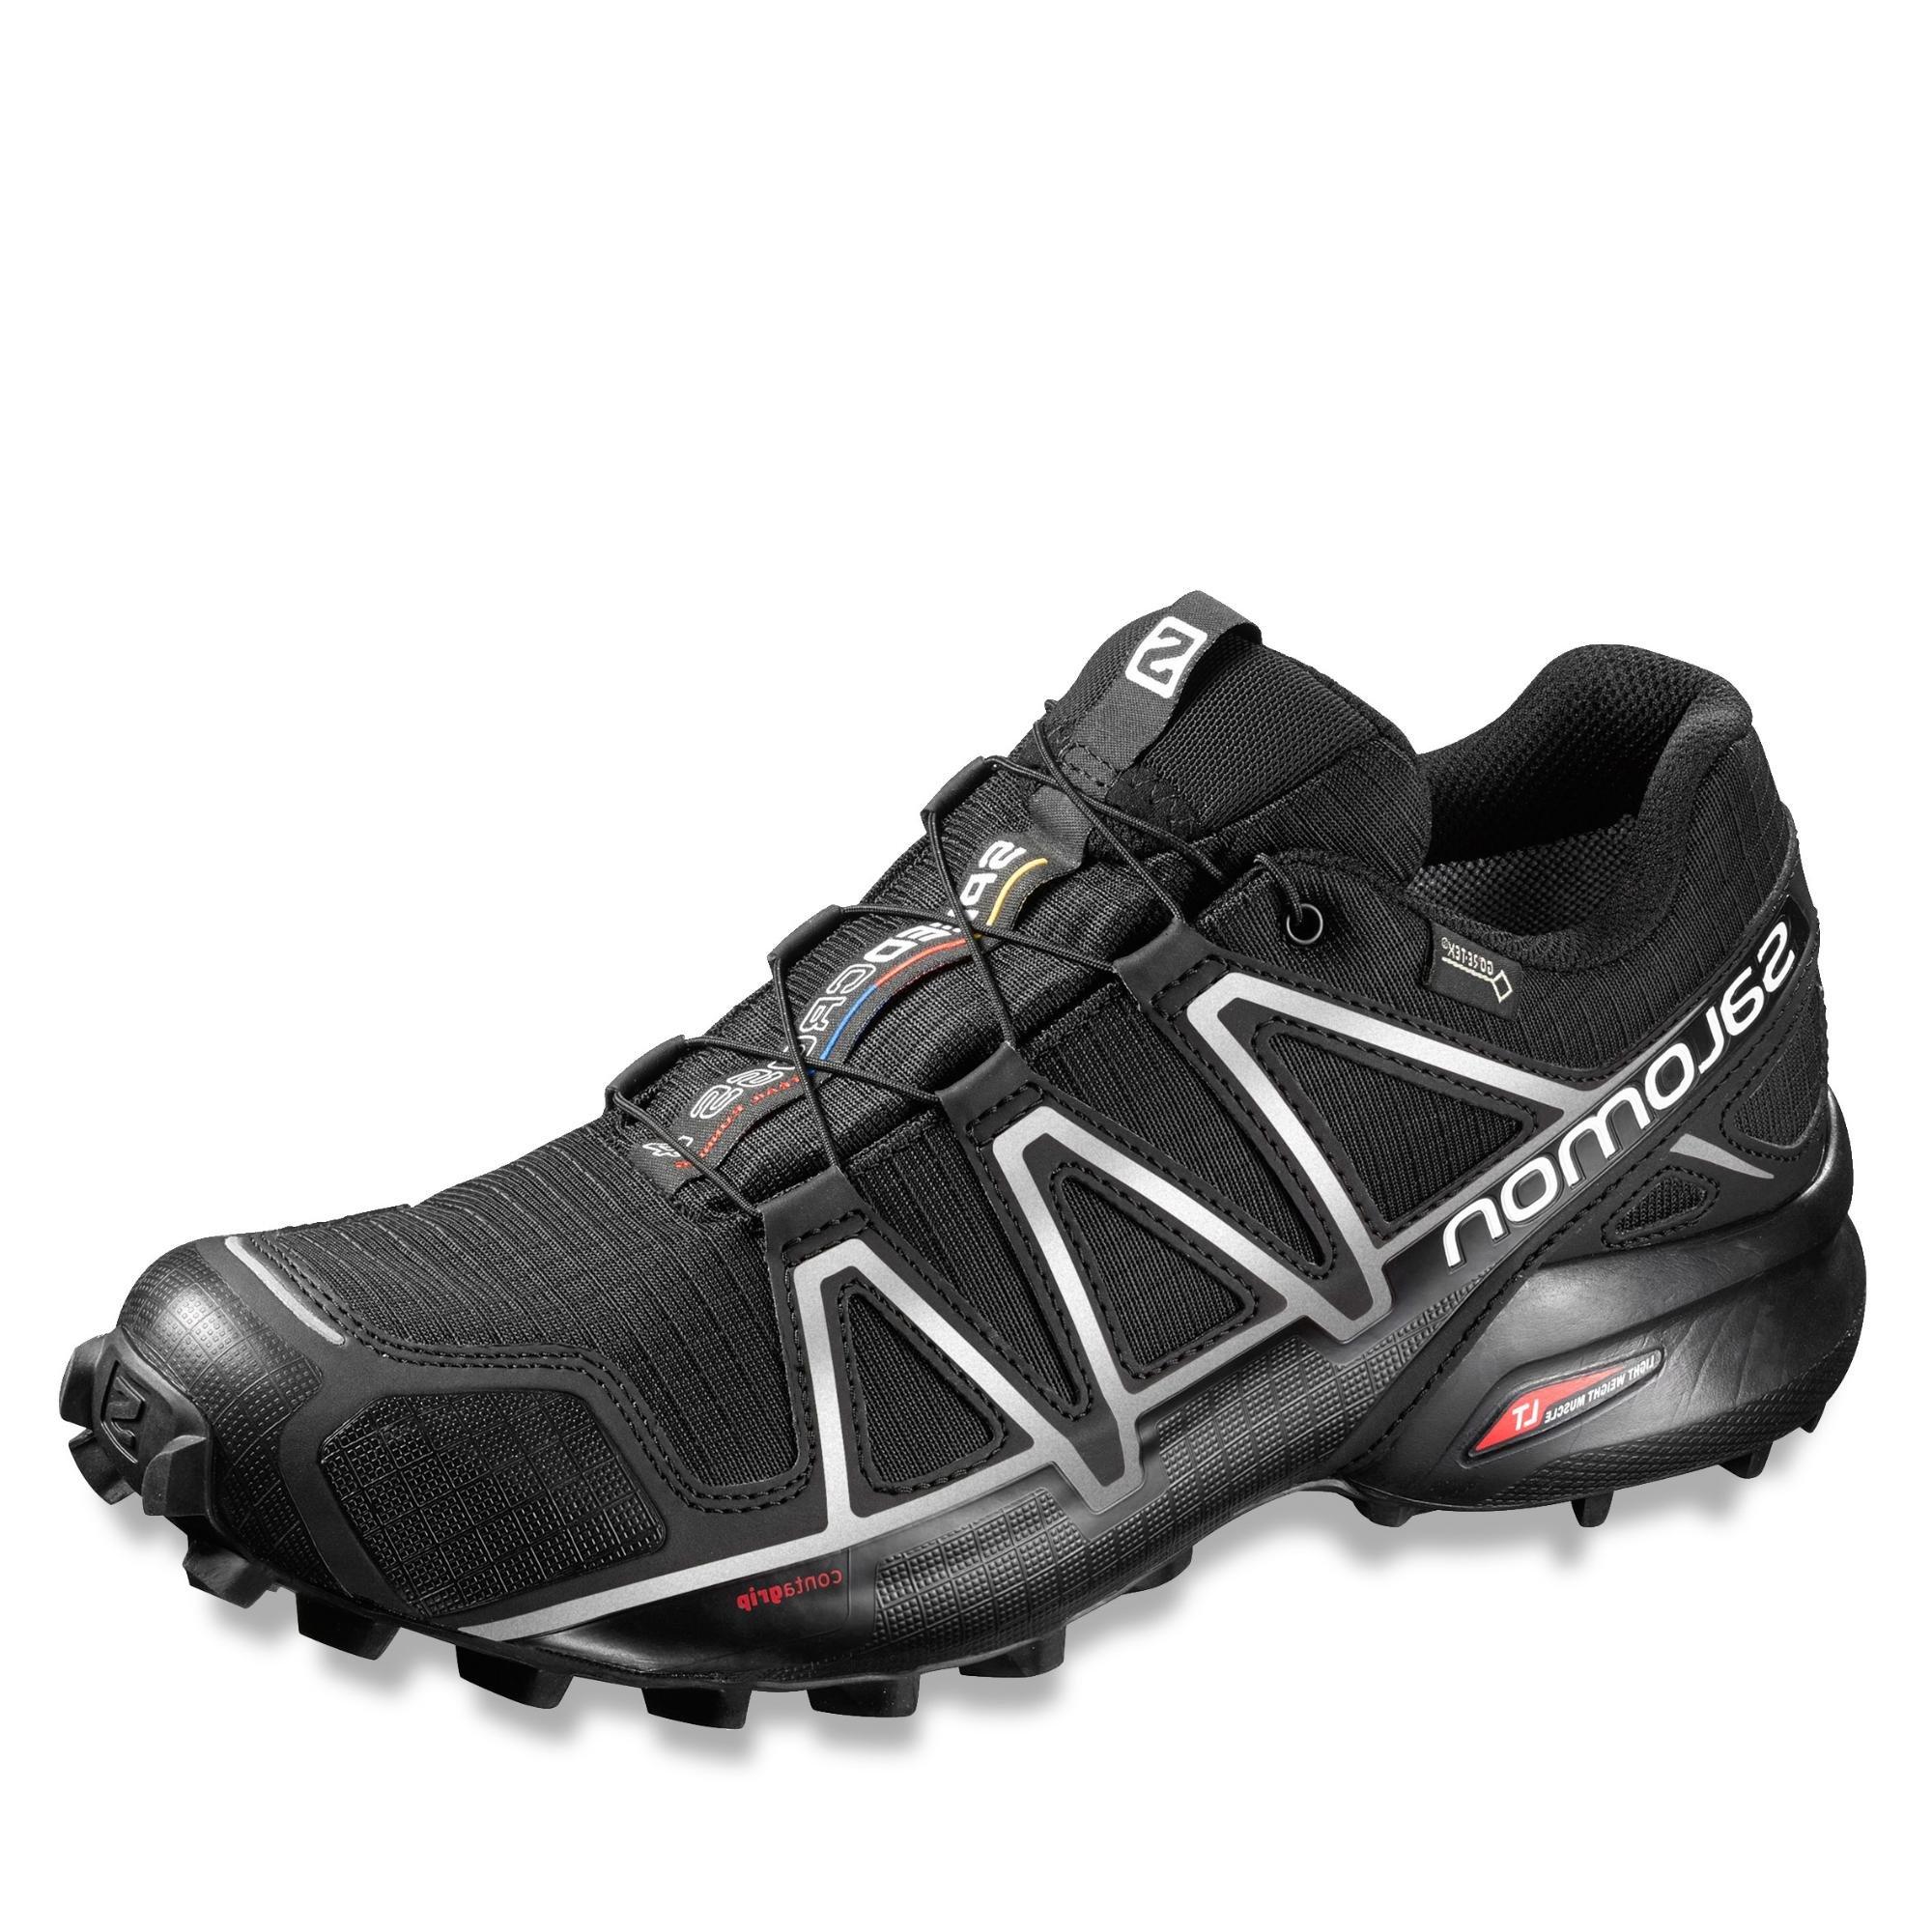 Salomon Speedcross 4 GTX Trekking New Size 13 Men. Black by Salomon